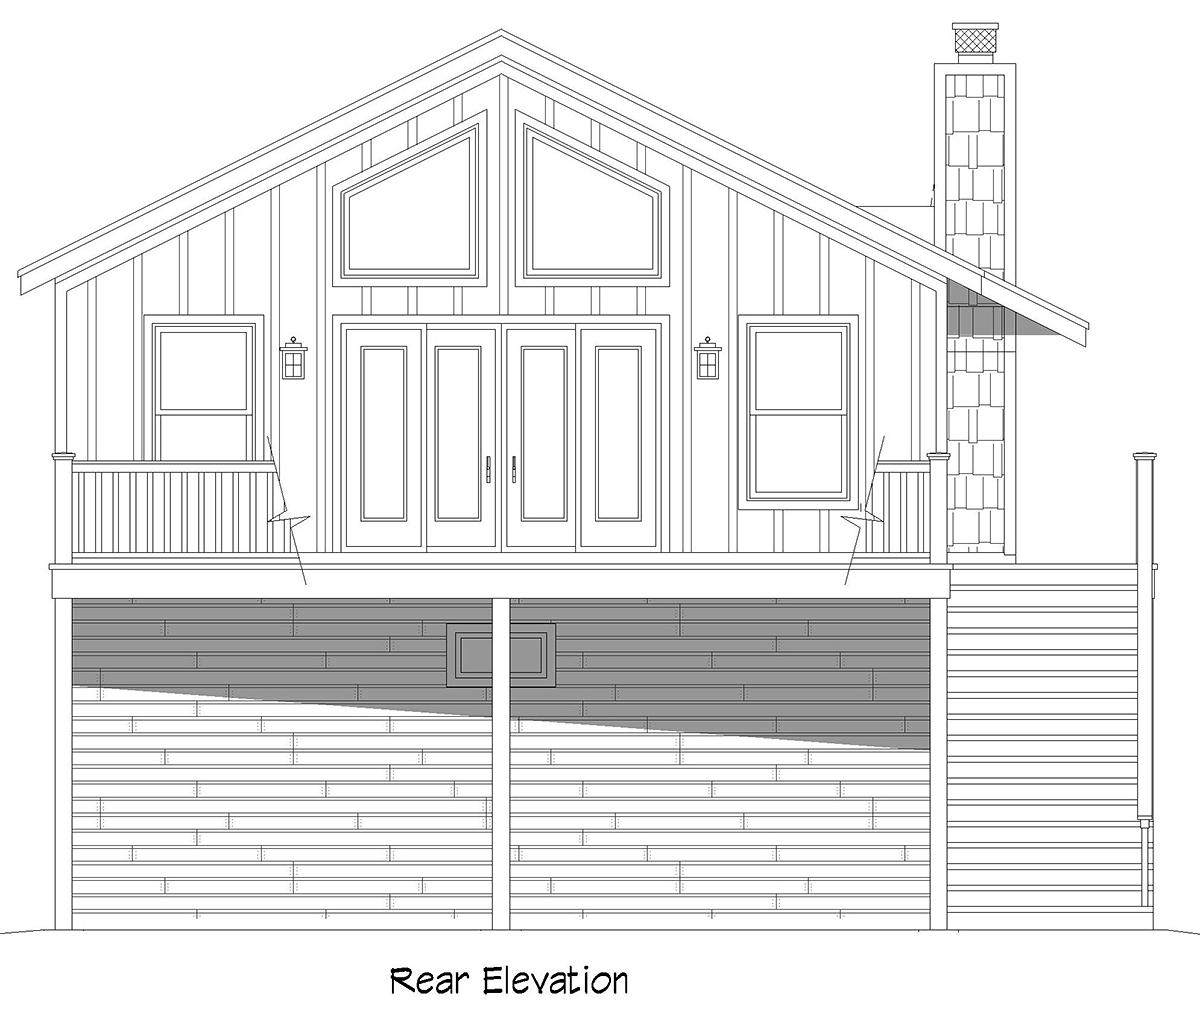 Cape Cod, Saltbox, Traditional Garage-Living Plan 52147 with 1 Beds, 1 Baths, 2 Car Garage Rear Elevation